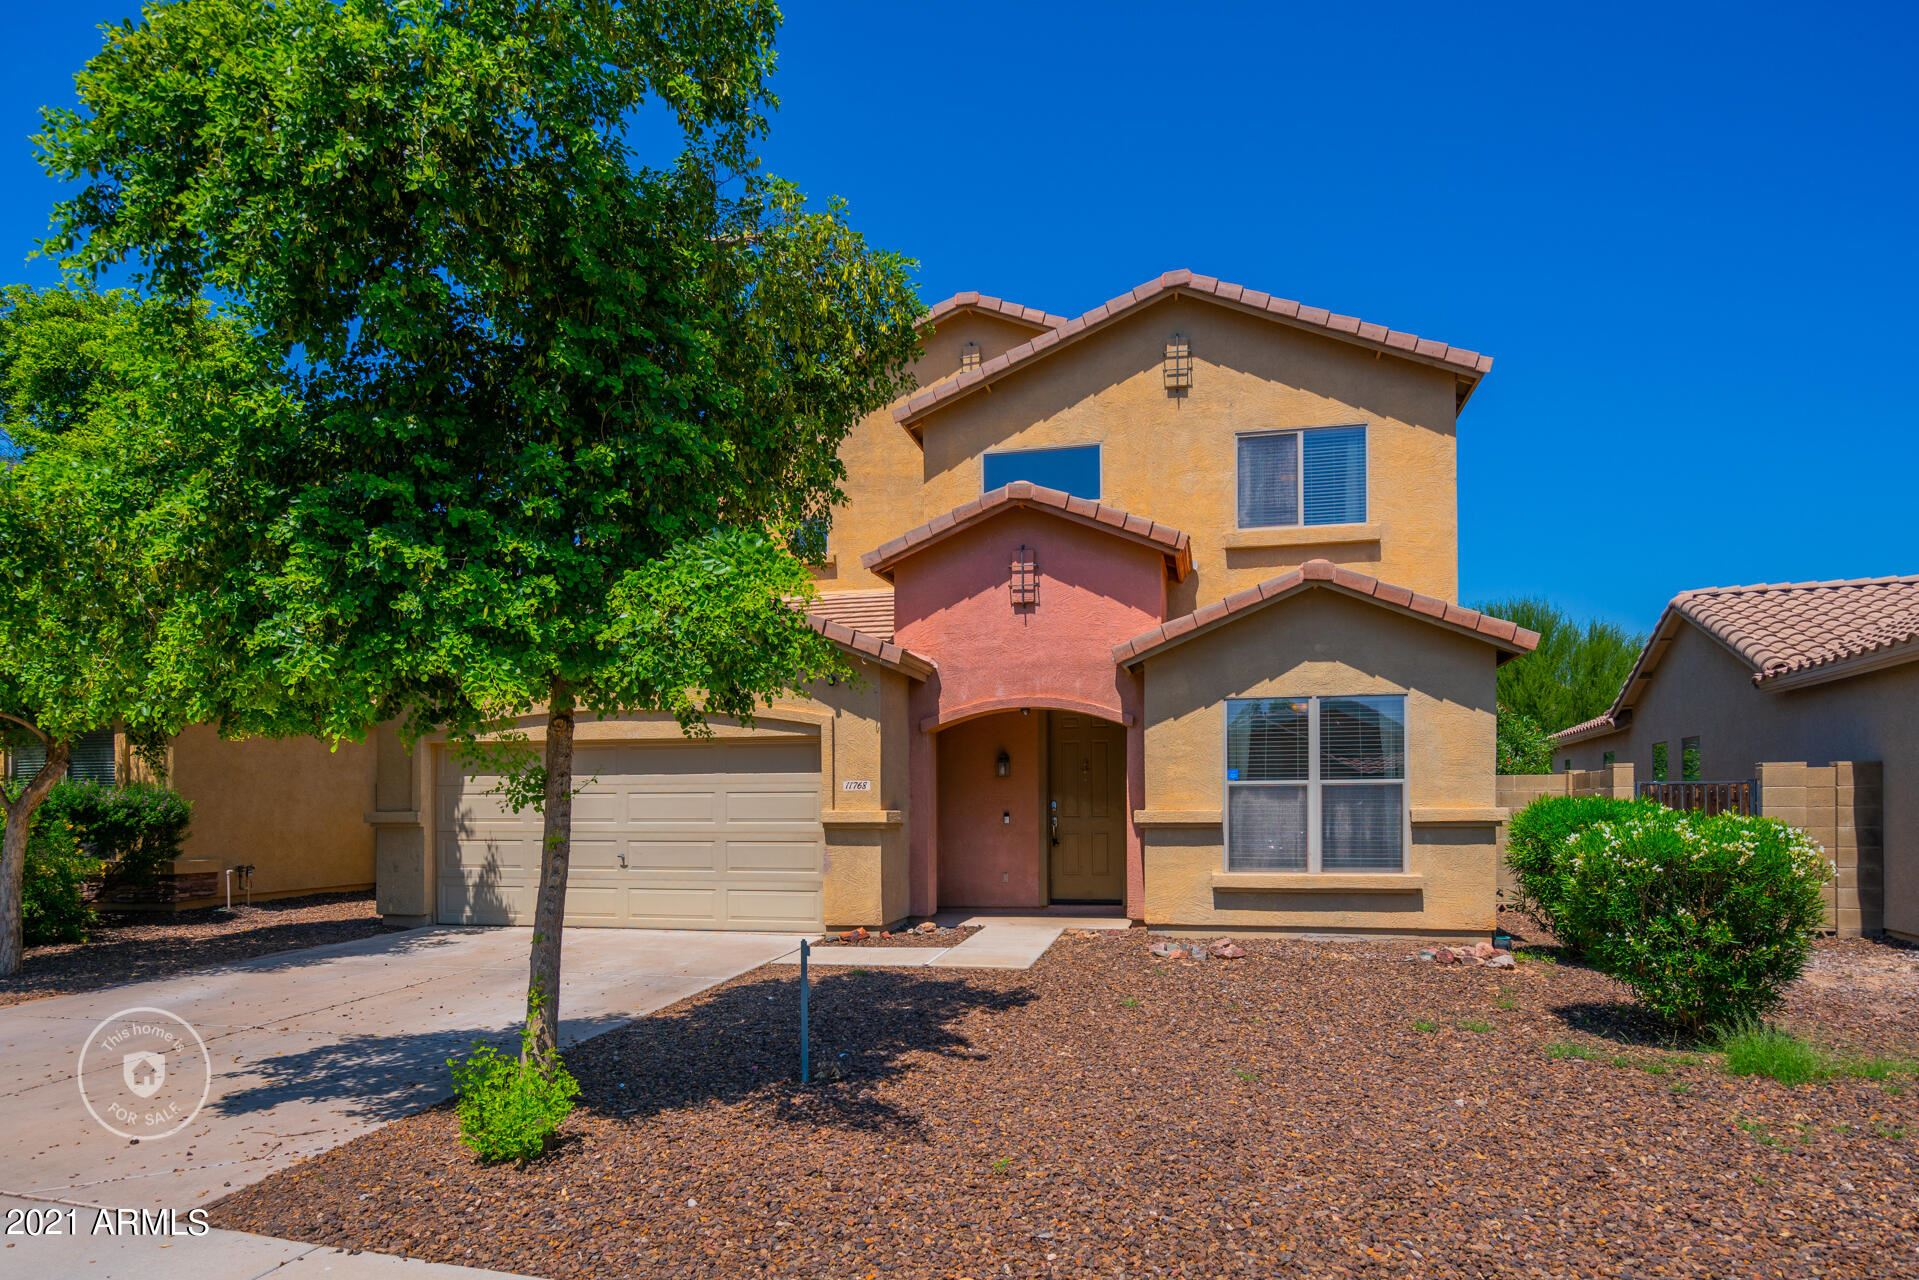 11768 W MOHAVE Street, Avondale, AZ 85323 - MLS#: 6284981